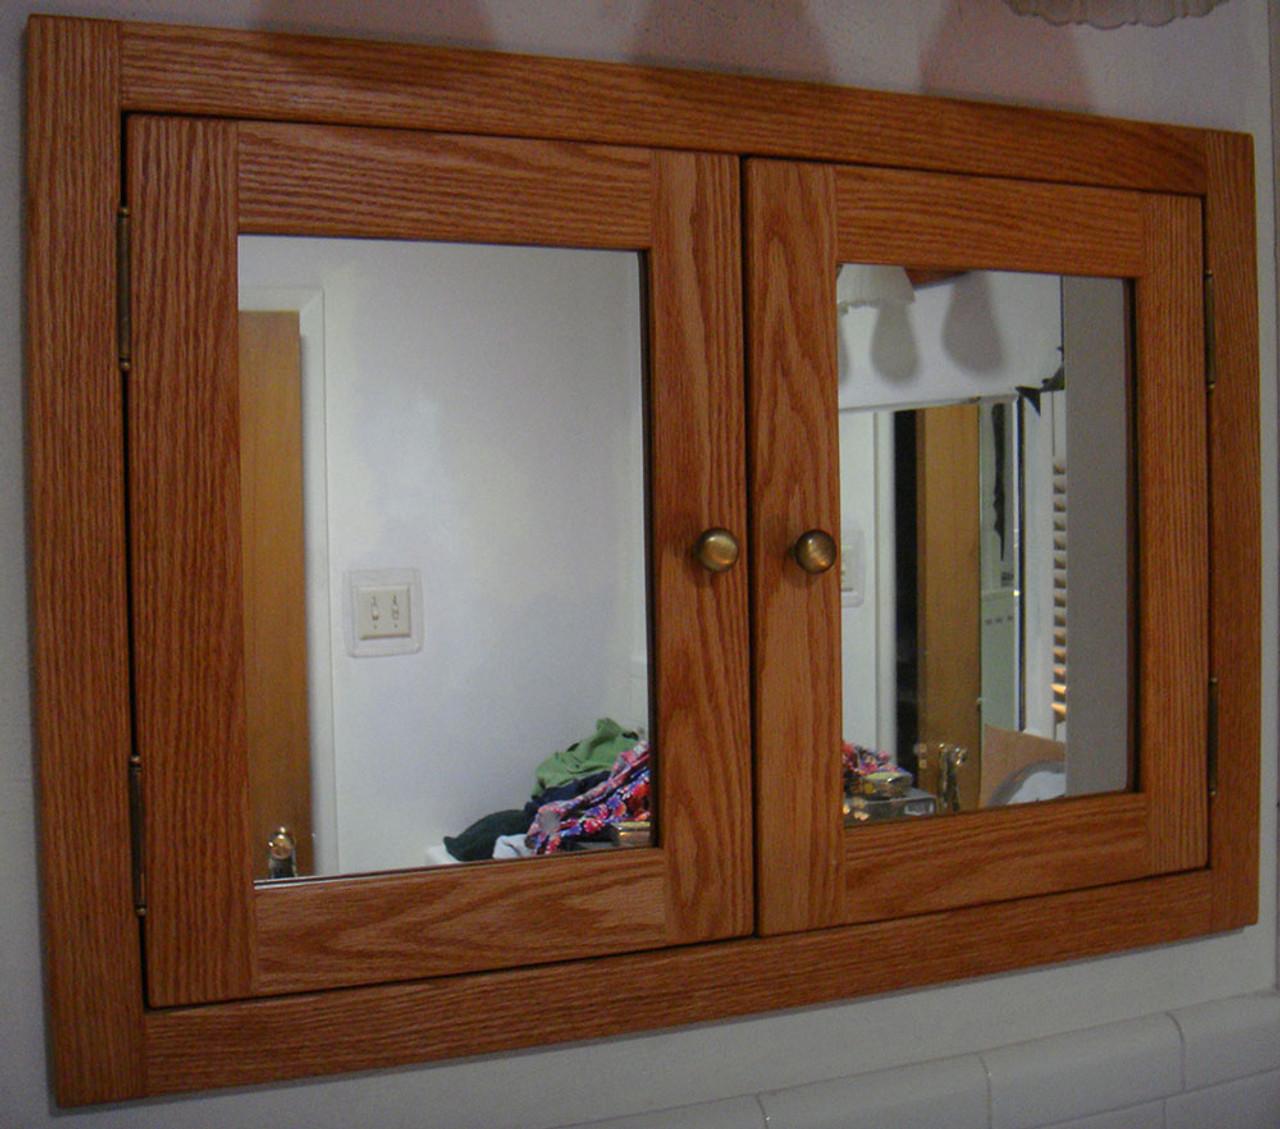 Strange Double Door Shaker Style Recessed Medicine Cabinet Cherry Oak Or Maple Finished Home Interior And Landscaping Mentranervesignezvosmurscom